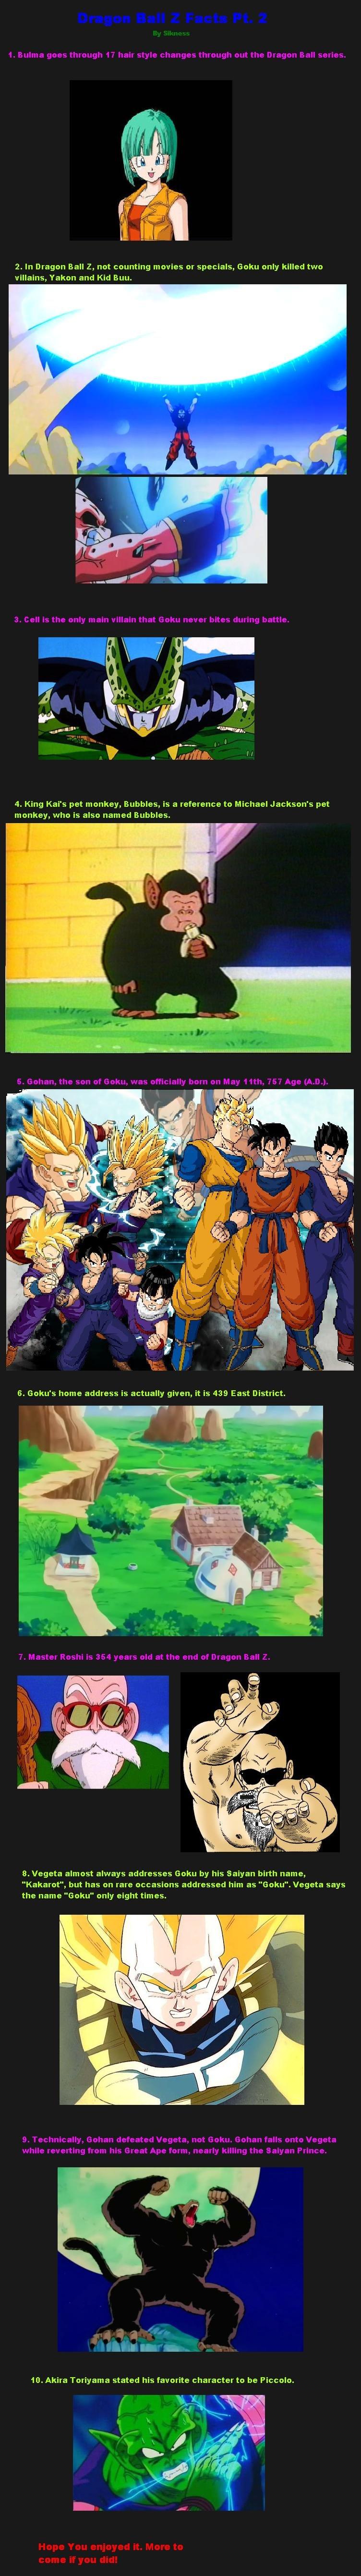 Dragon Ball Z Facts Pt. 2. Part 2 of my Dragon Ball Z Facts. Enjoy.. 2. m Dragon Ball z, not counting movies or specials, Goku only killed two villains, vaken a Dragon Ball Z Goku Gohan Vegeta piccolo cell kid buu